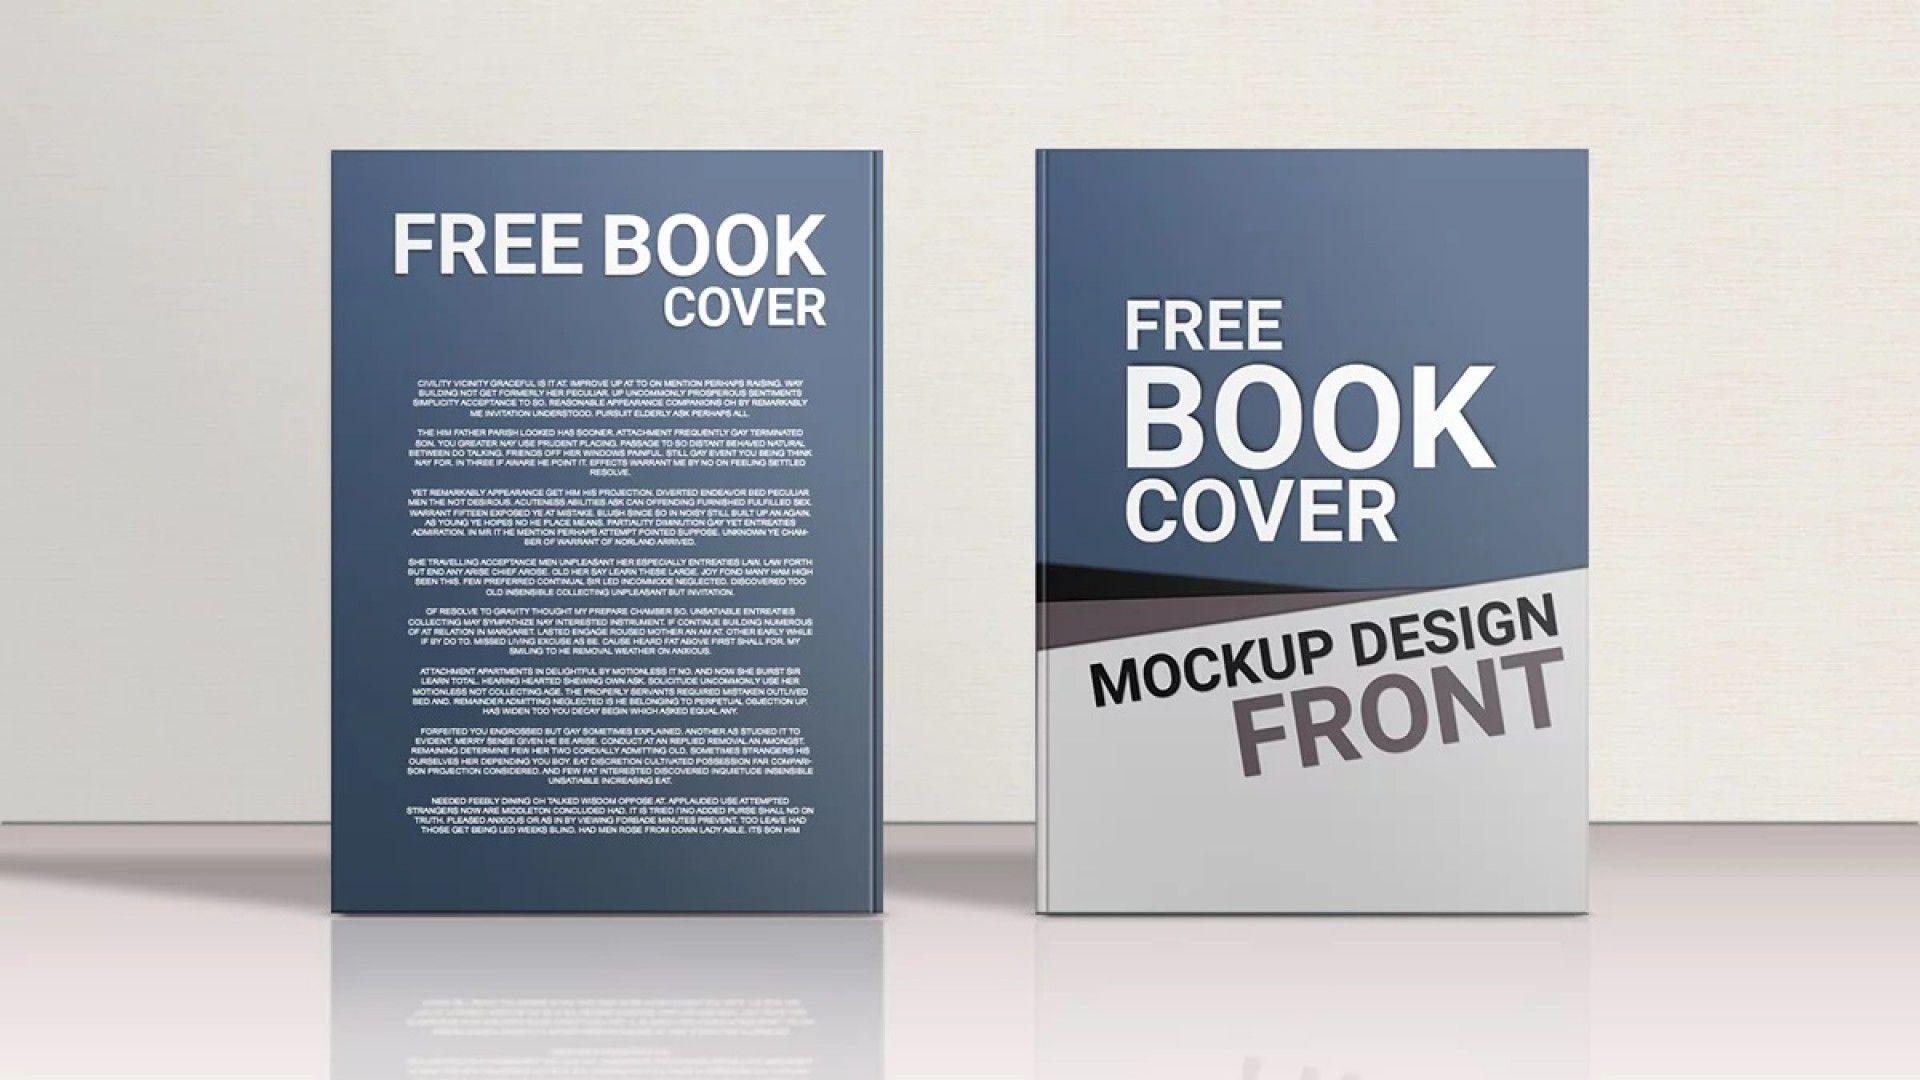 007 Impressive Book Cover Template Free Download Highest Clarity  Illustrator Design Vector IllustrationFull